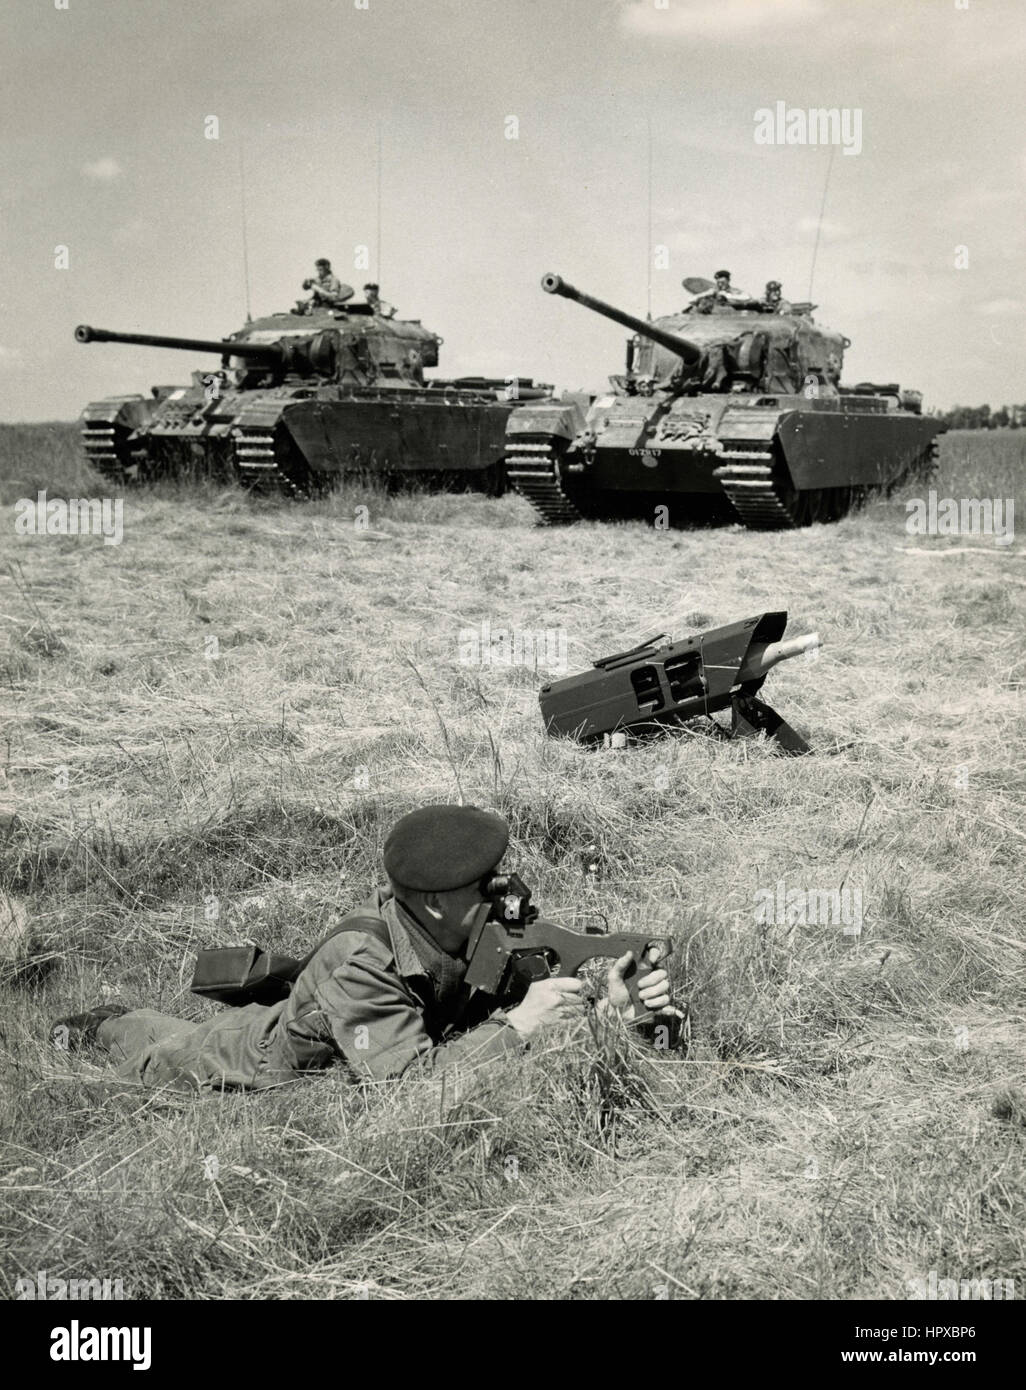 British infantry with tanks, UK - Stock Image